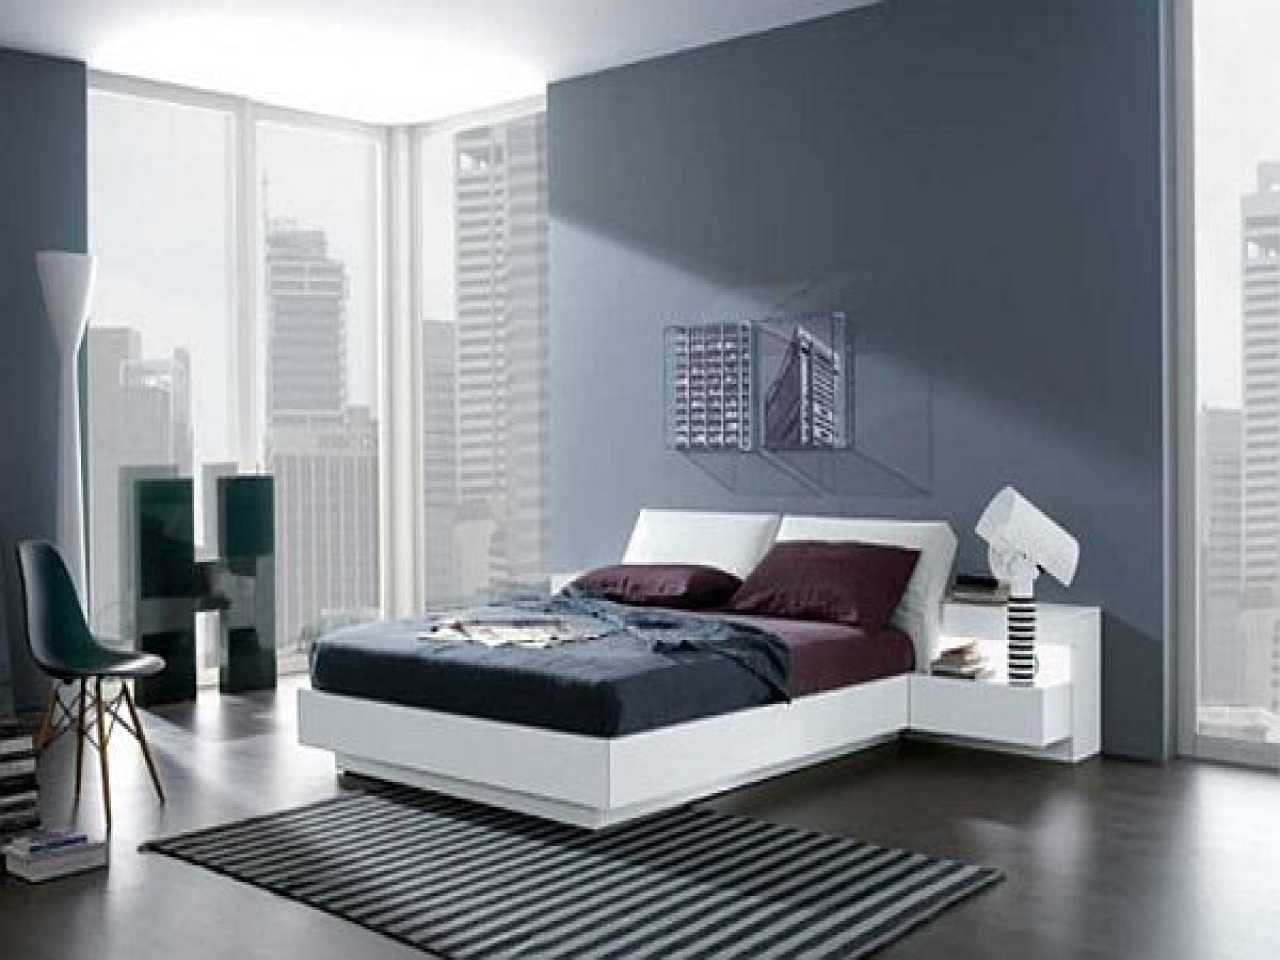 Sparkling Modern Bedroom Paint Colors Trend Modern Bedroom Paint Colors 12 For Bedroom Design Idea Modern Bedroom Colors Bedroom Color Schemes Bedroom Colors